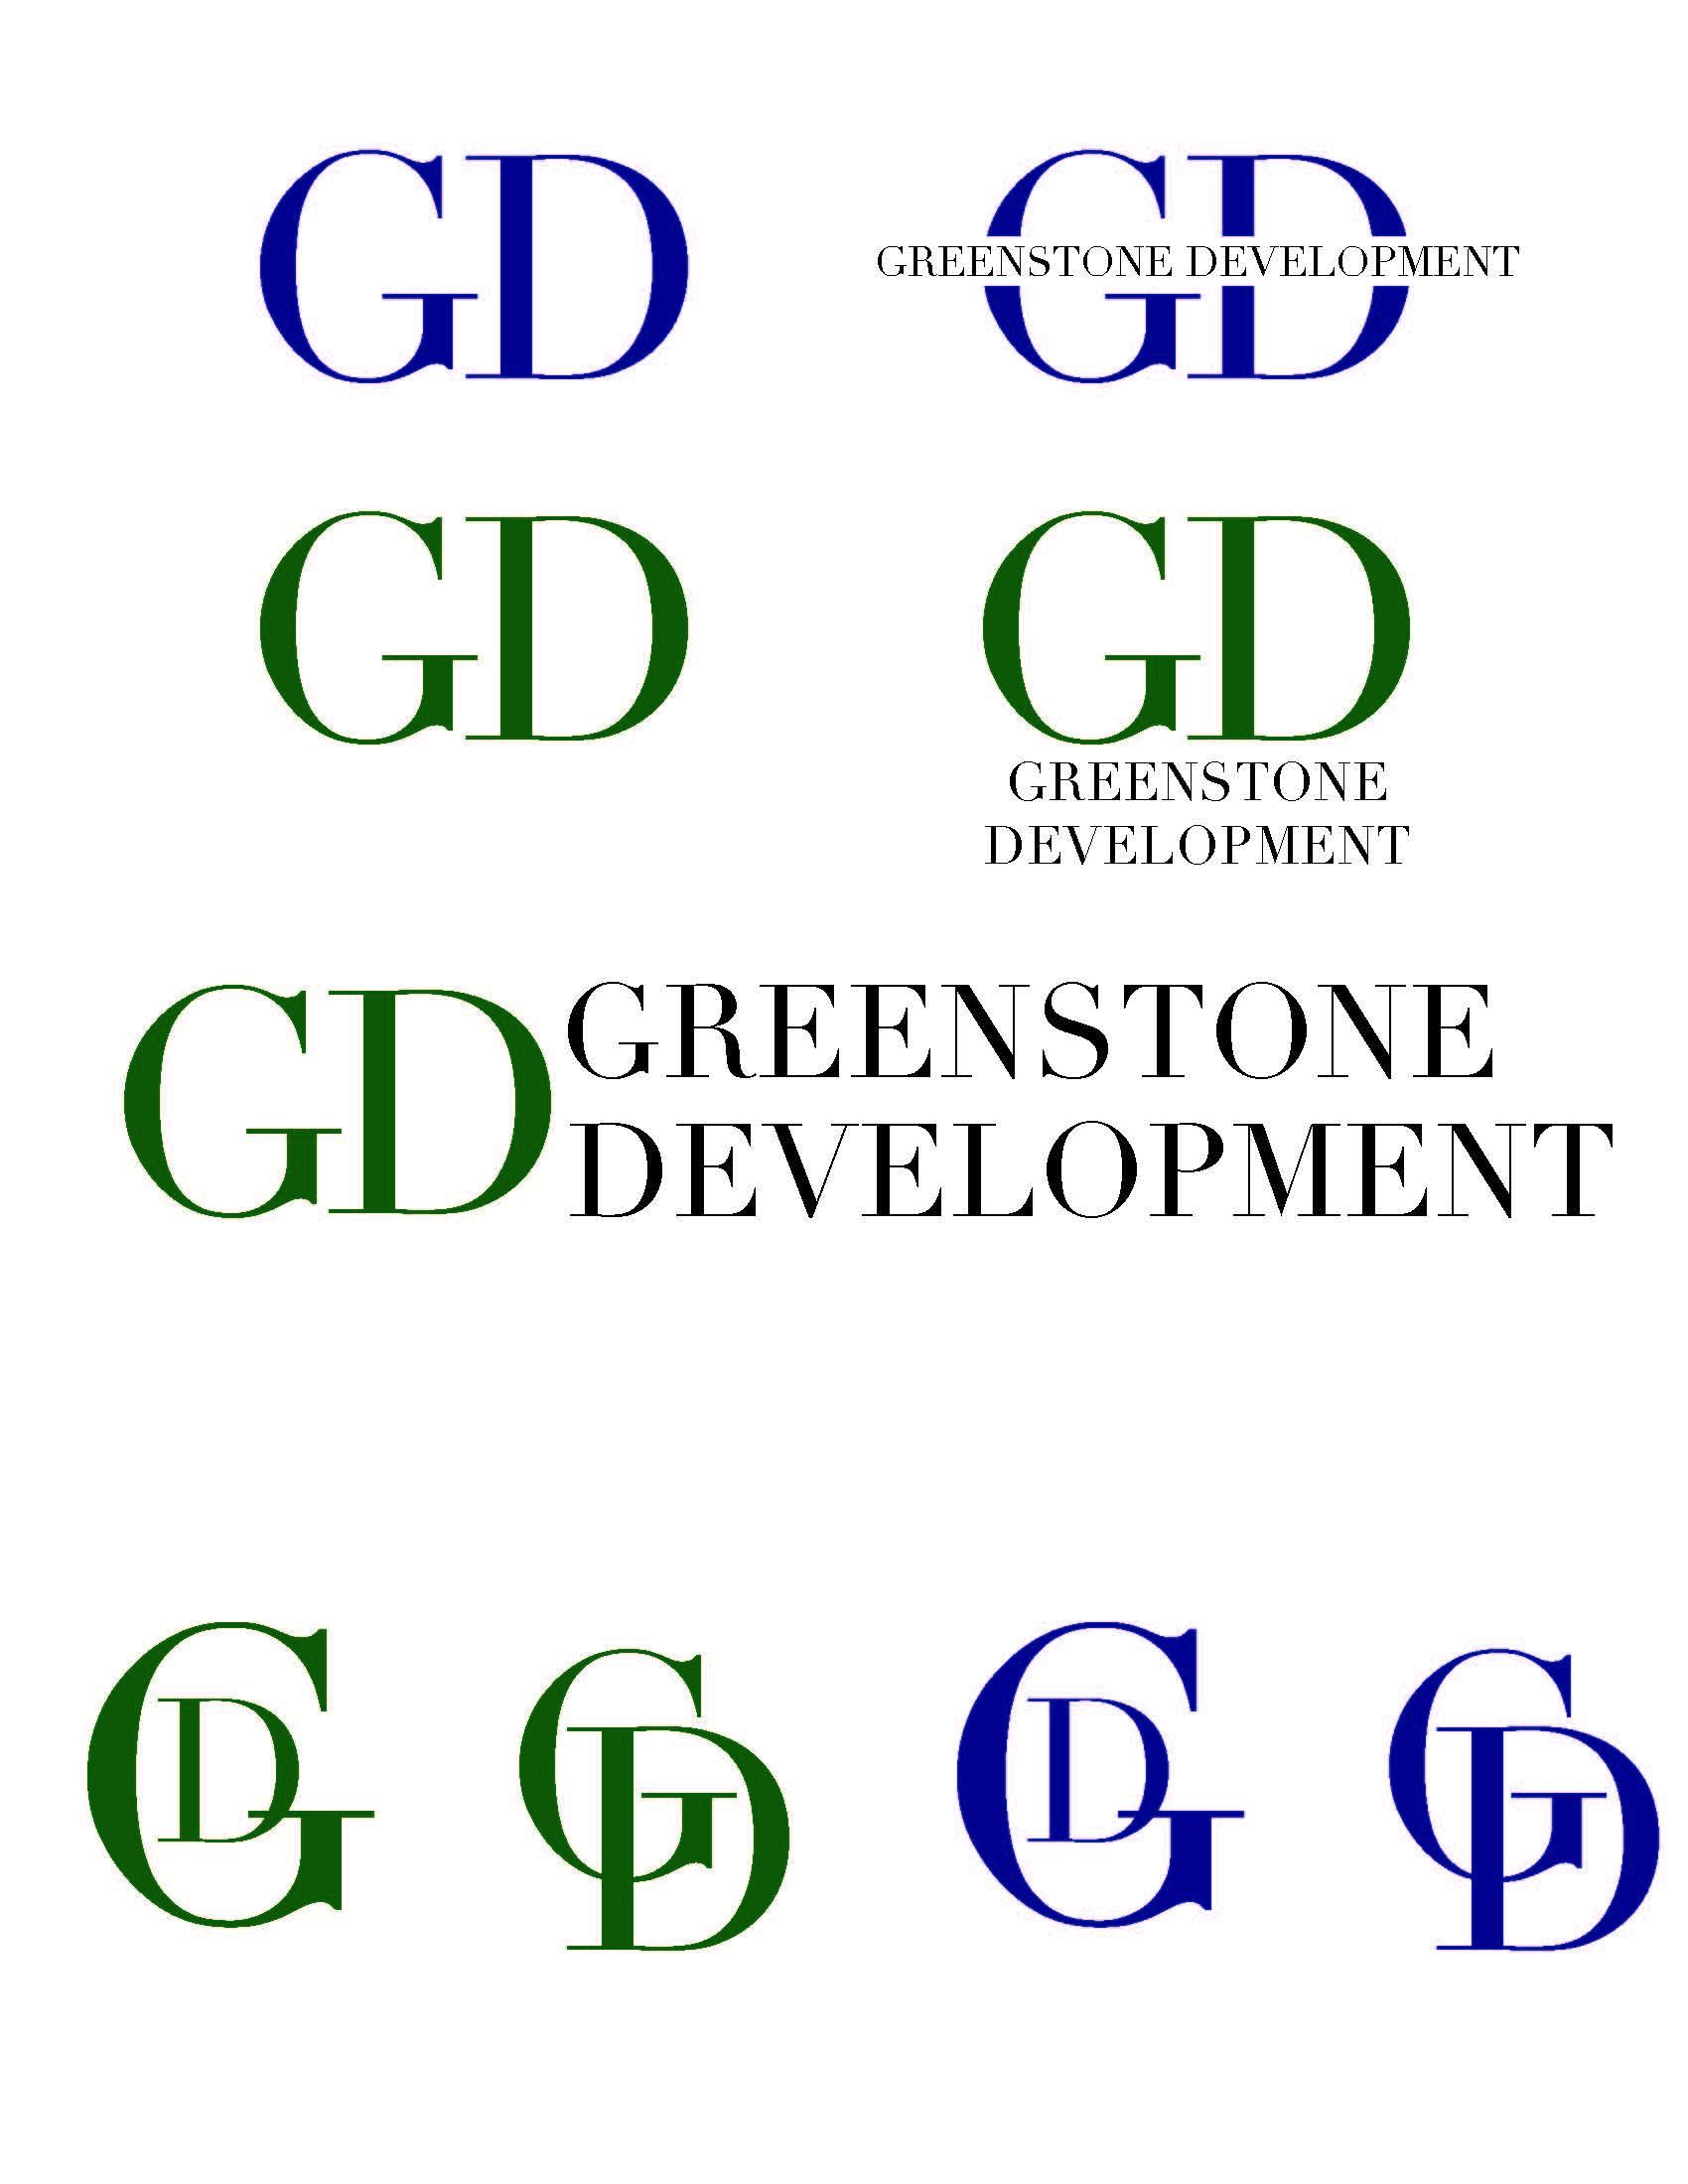 greenstone_development_Page_1.jpg